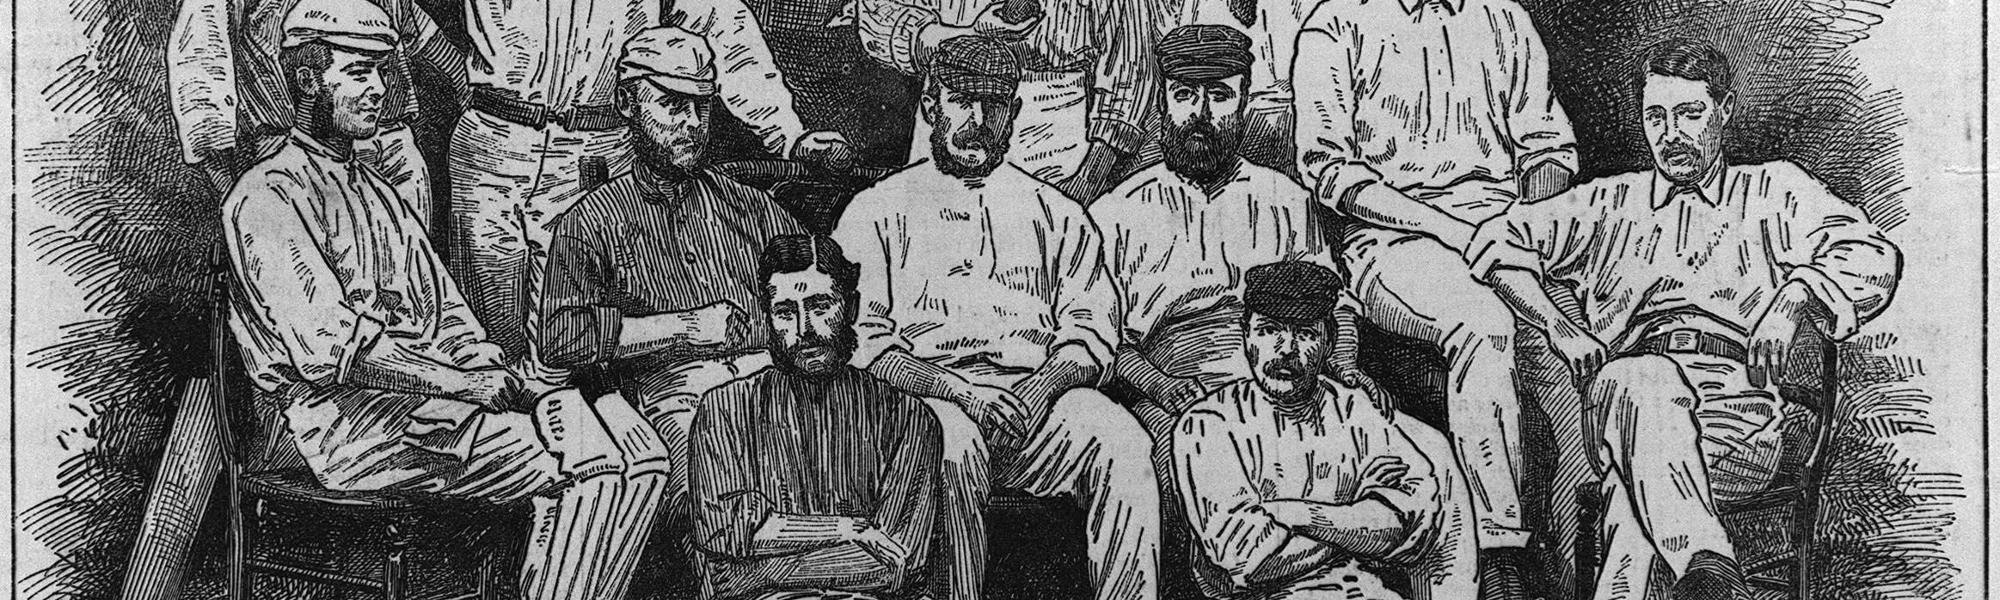 England - first XI 1877